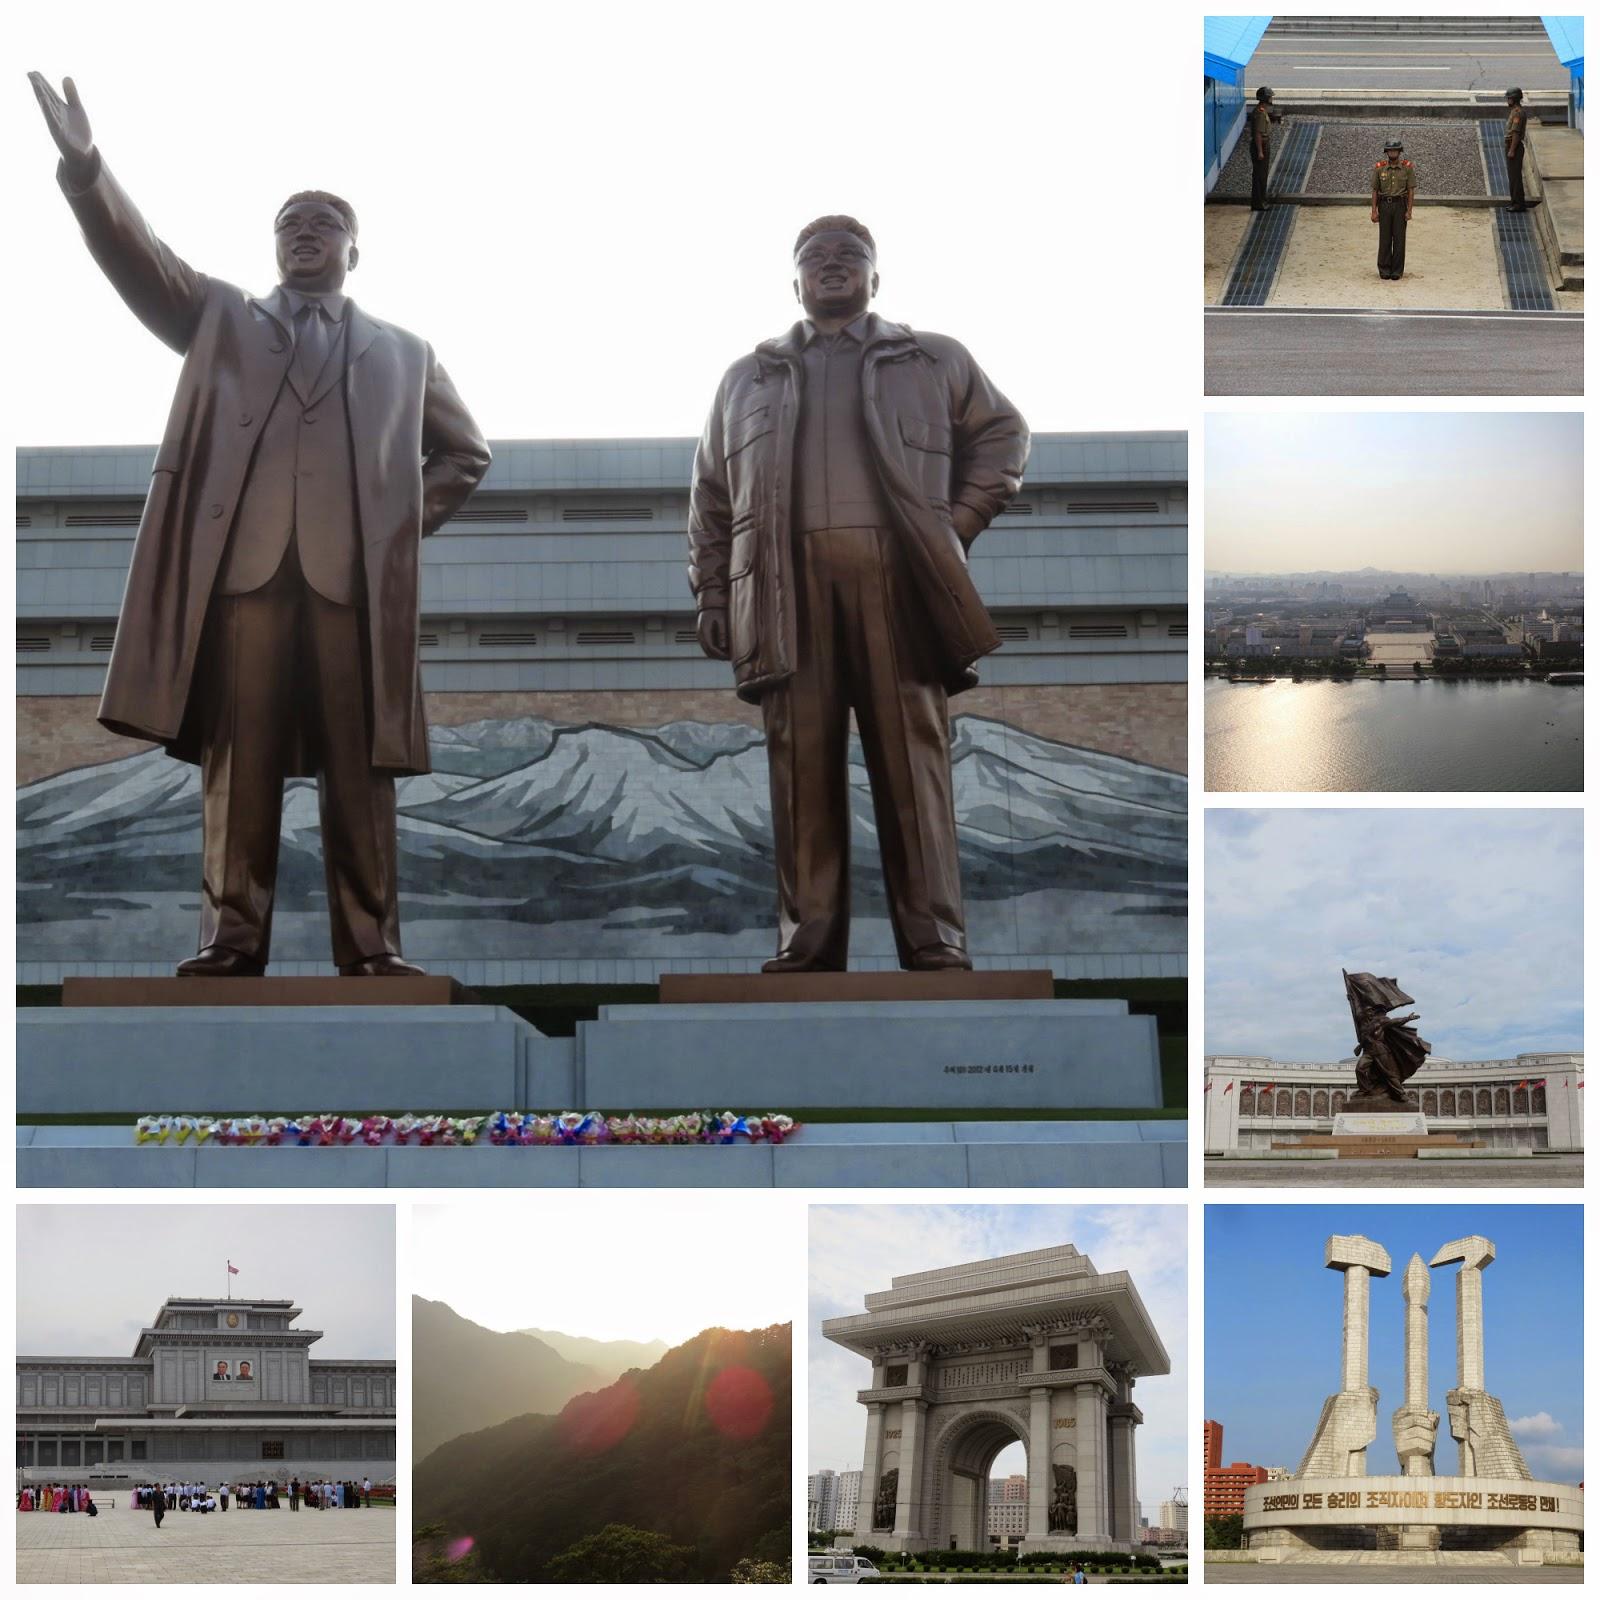 http://alitraveling.blog.hu/tags/%C3%89szak-Korea